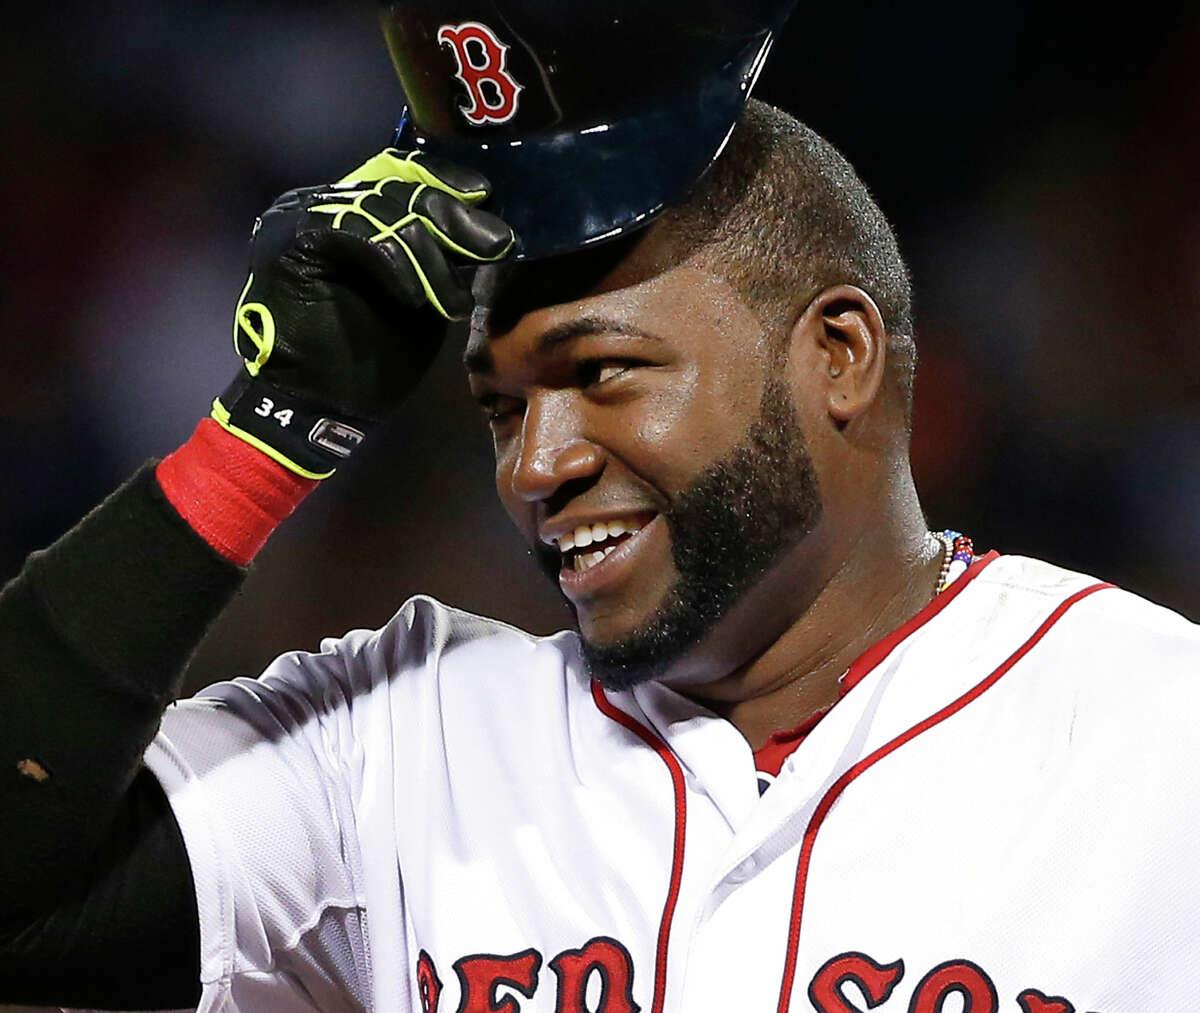 Boston Red Sox designated hitter David Ortiz says he will retire after 2016 season.